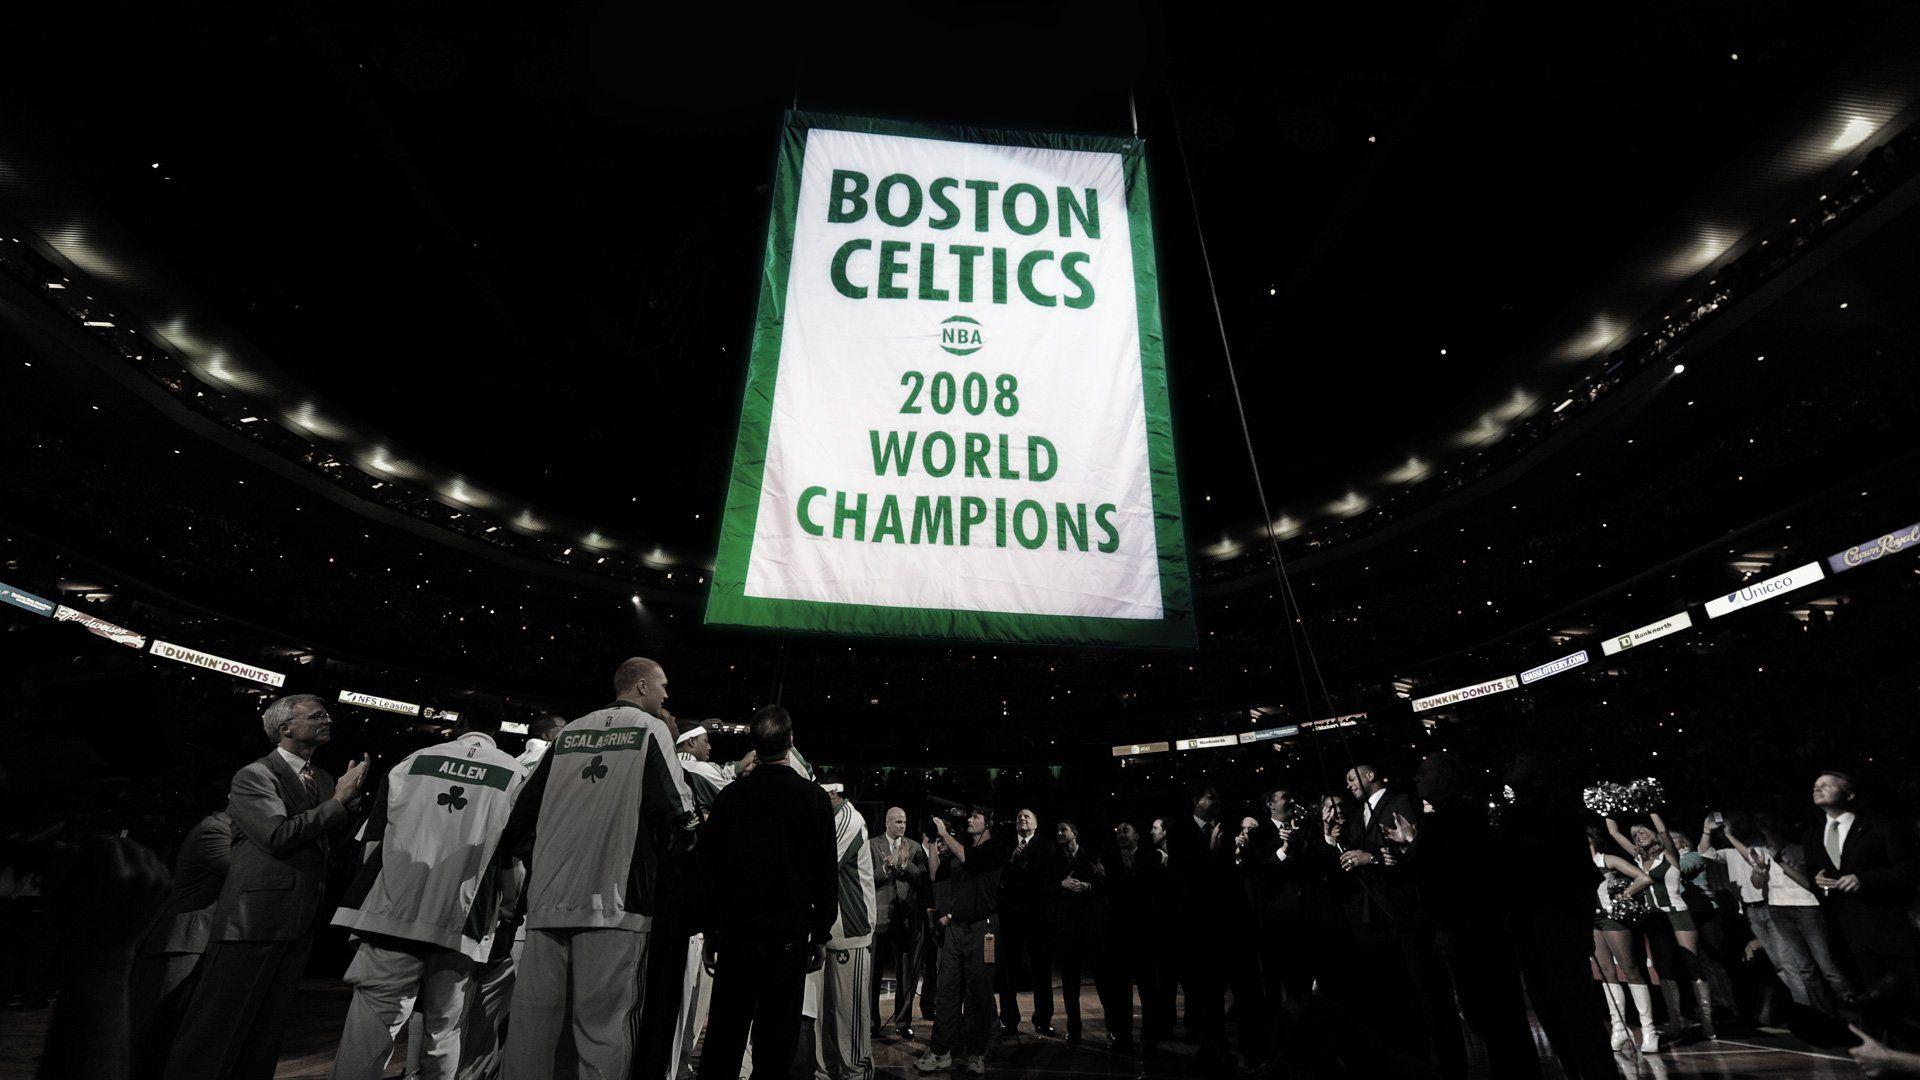 Boston Celtics Wallpaper Boston Celtics Wallpaper Boston Celtics Celtic